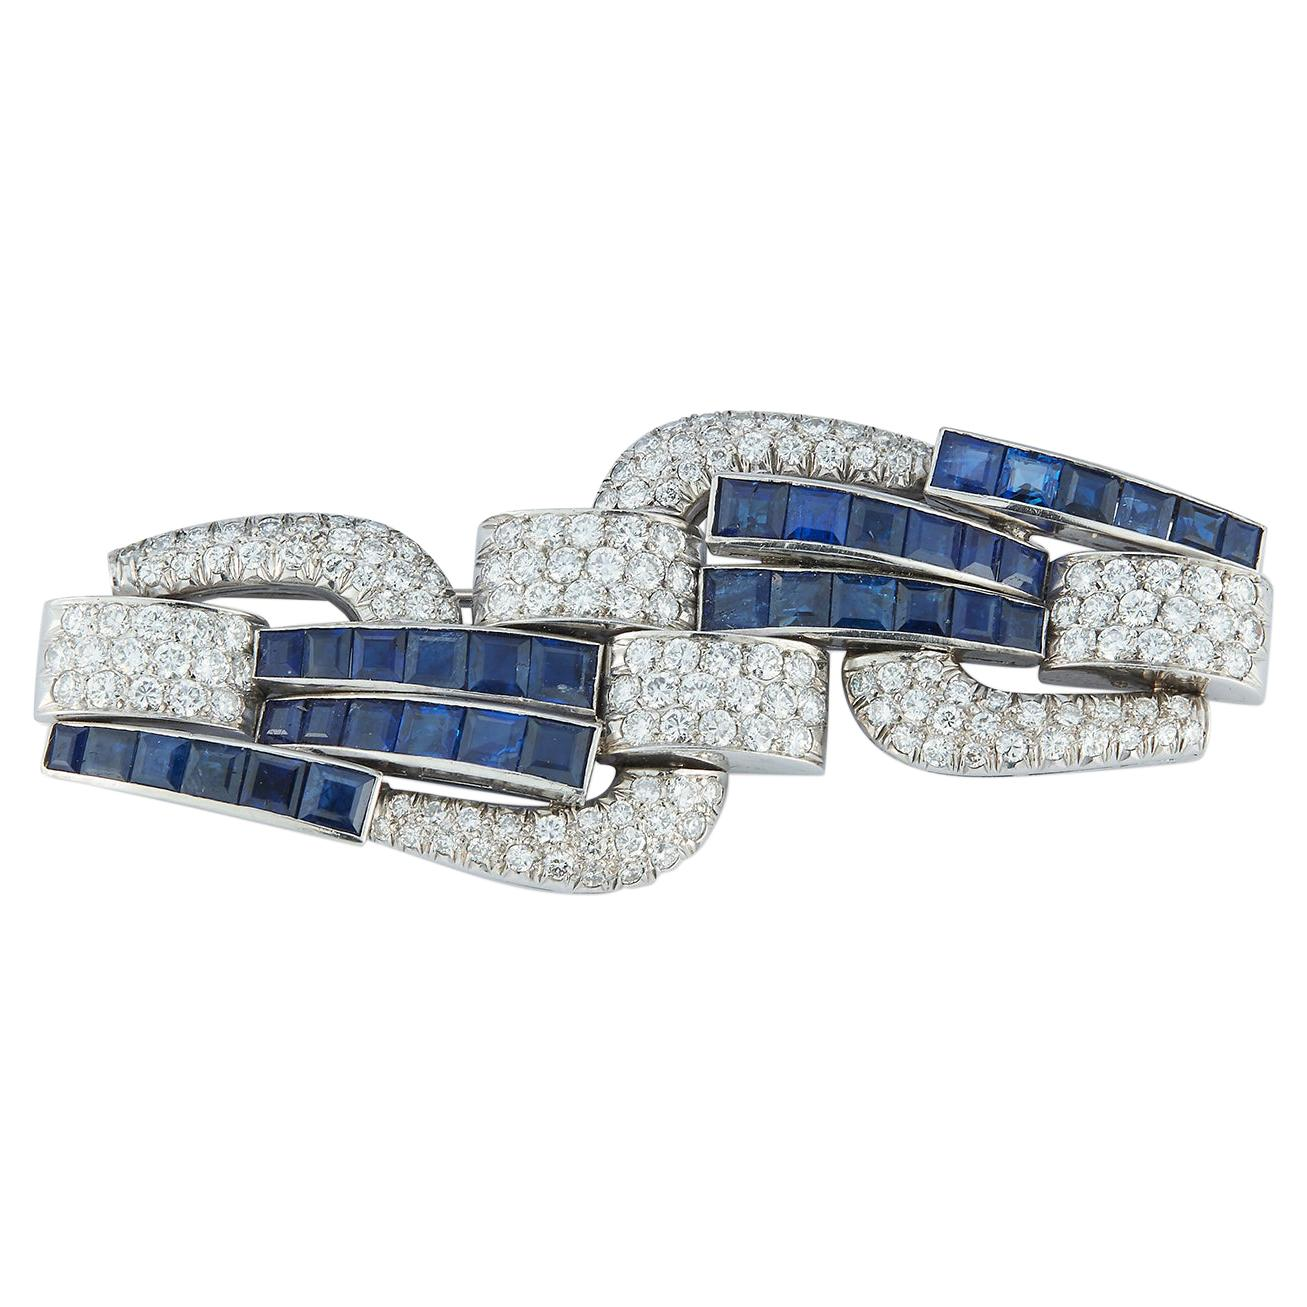 Art Deco Sapphire and Diamond Geometric Brooch